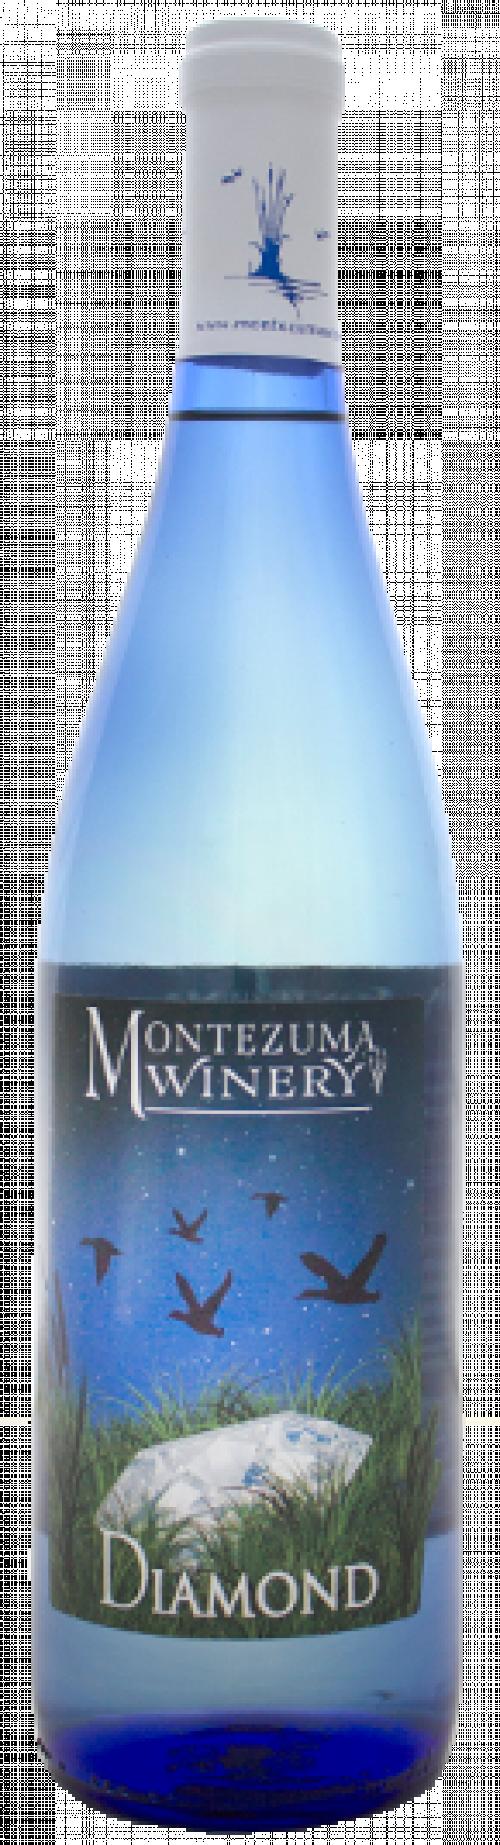 Montezuma Diamond 750ml NV